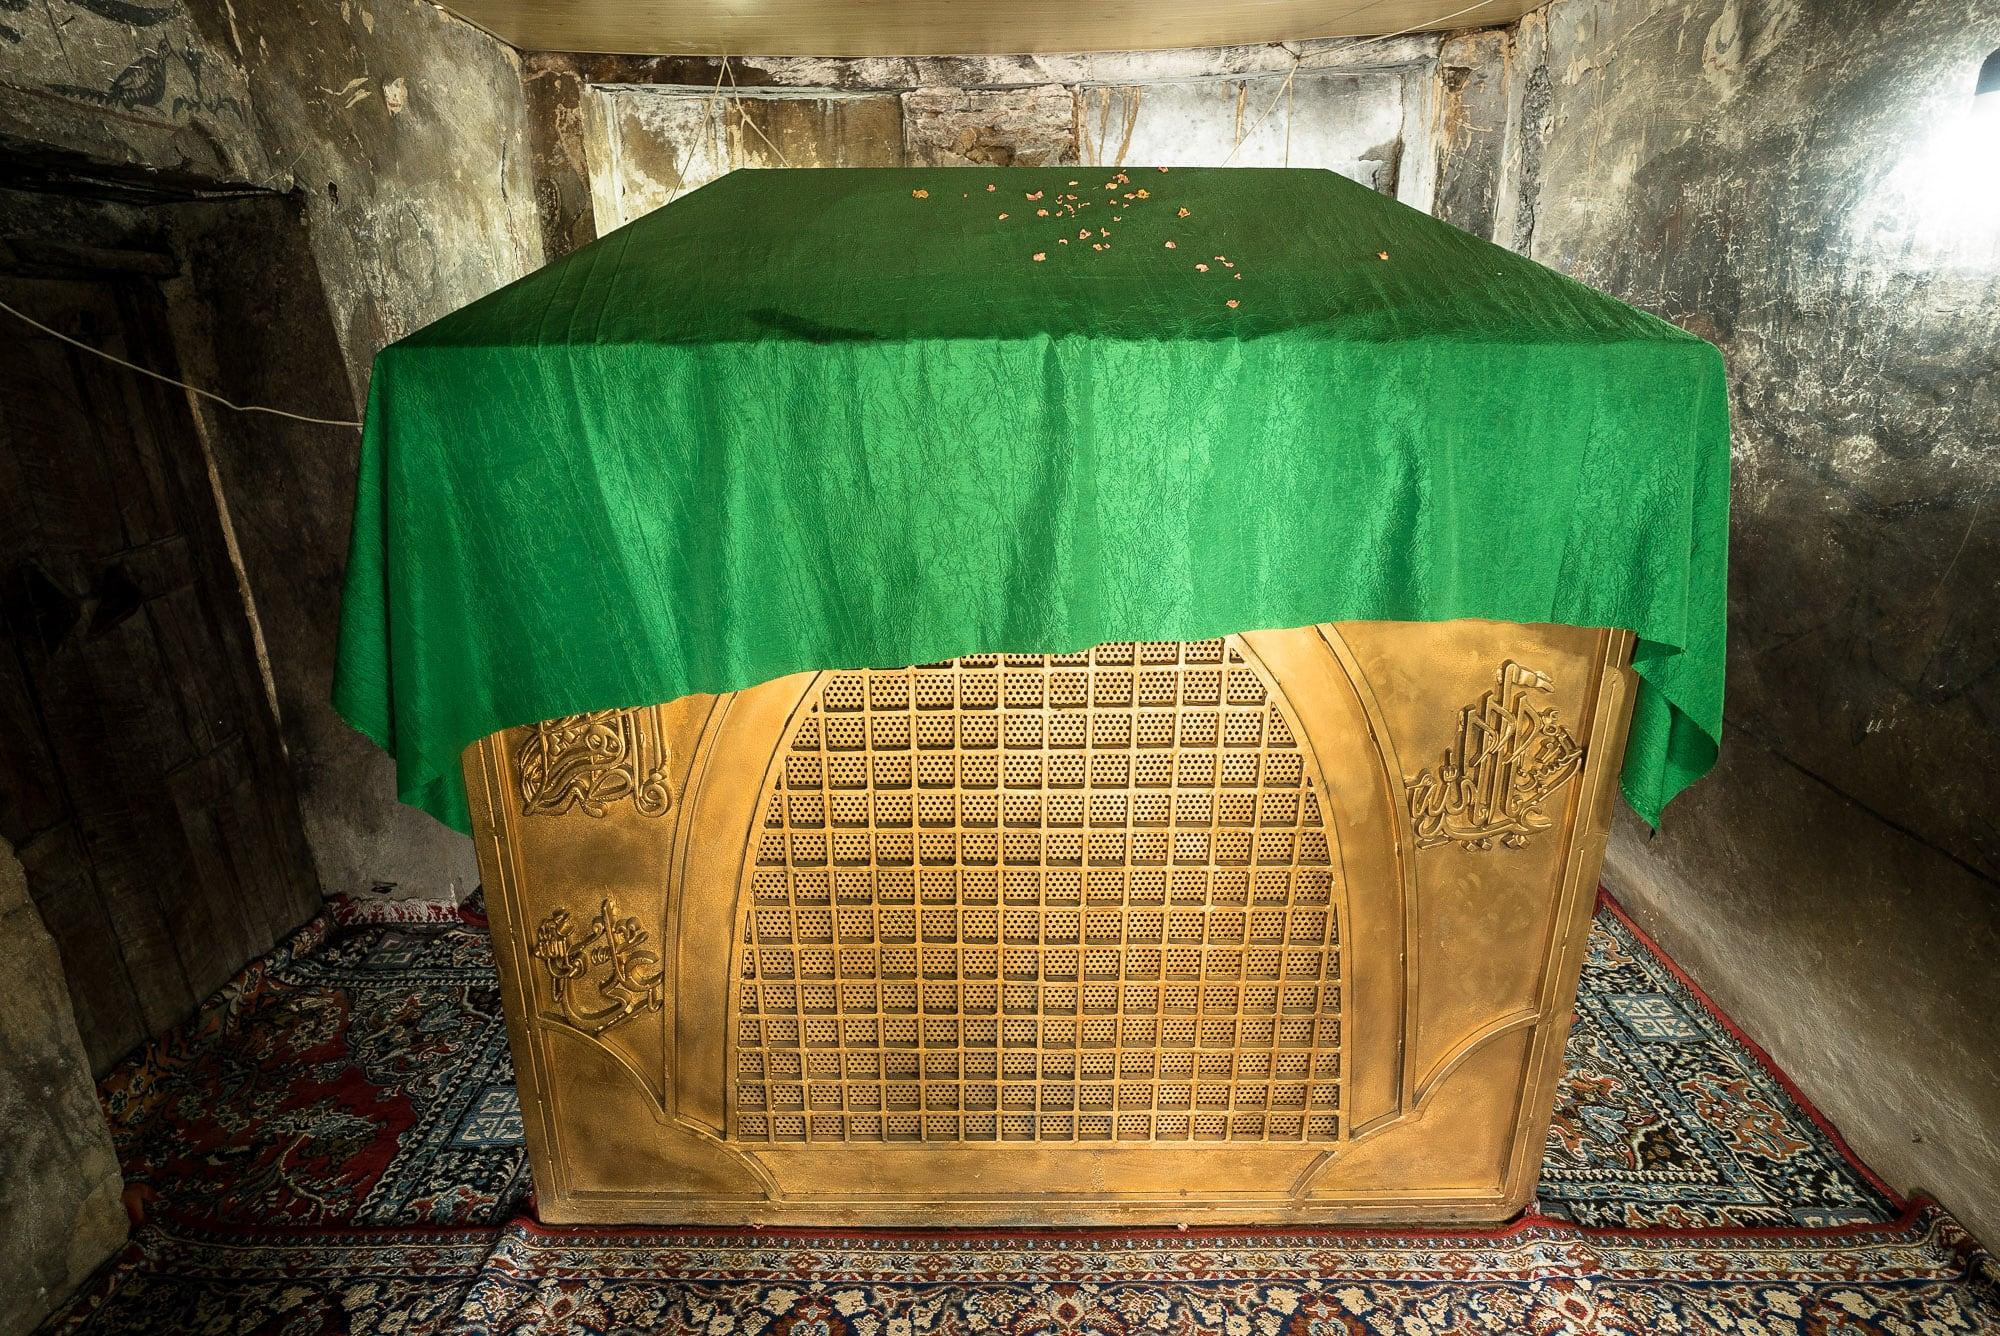 the shrine itself